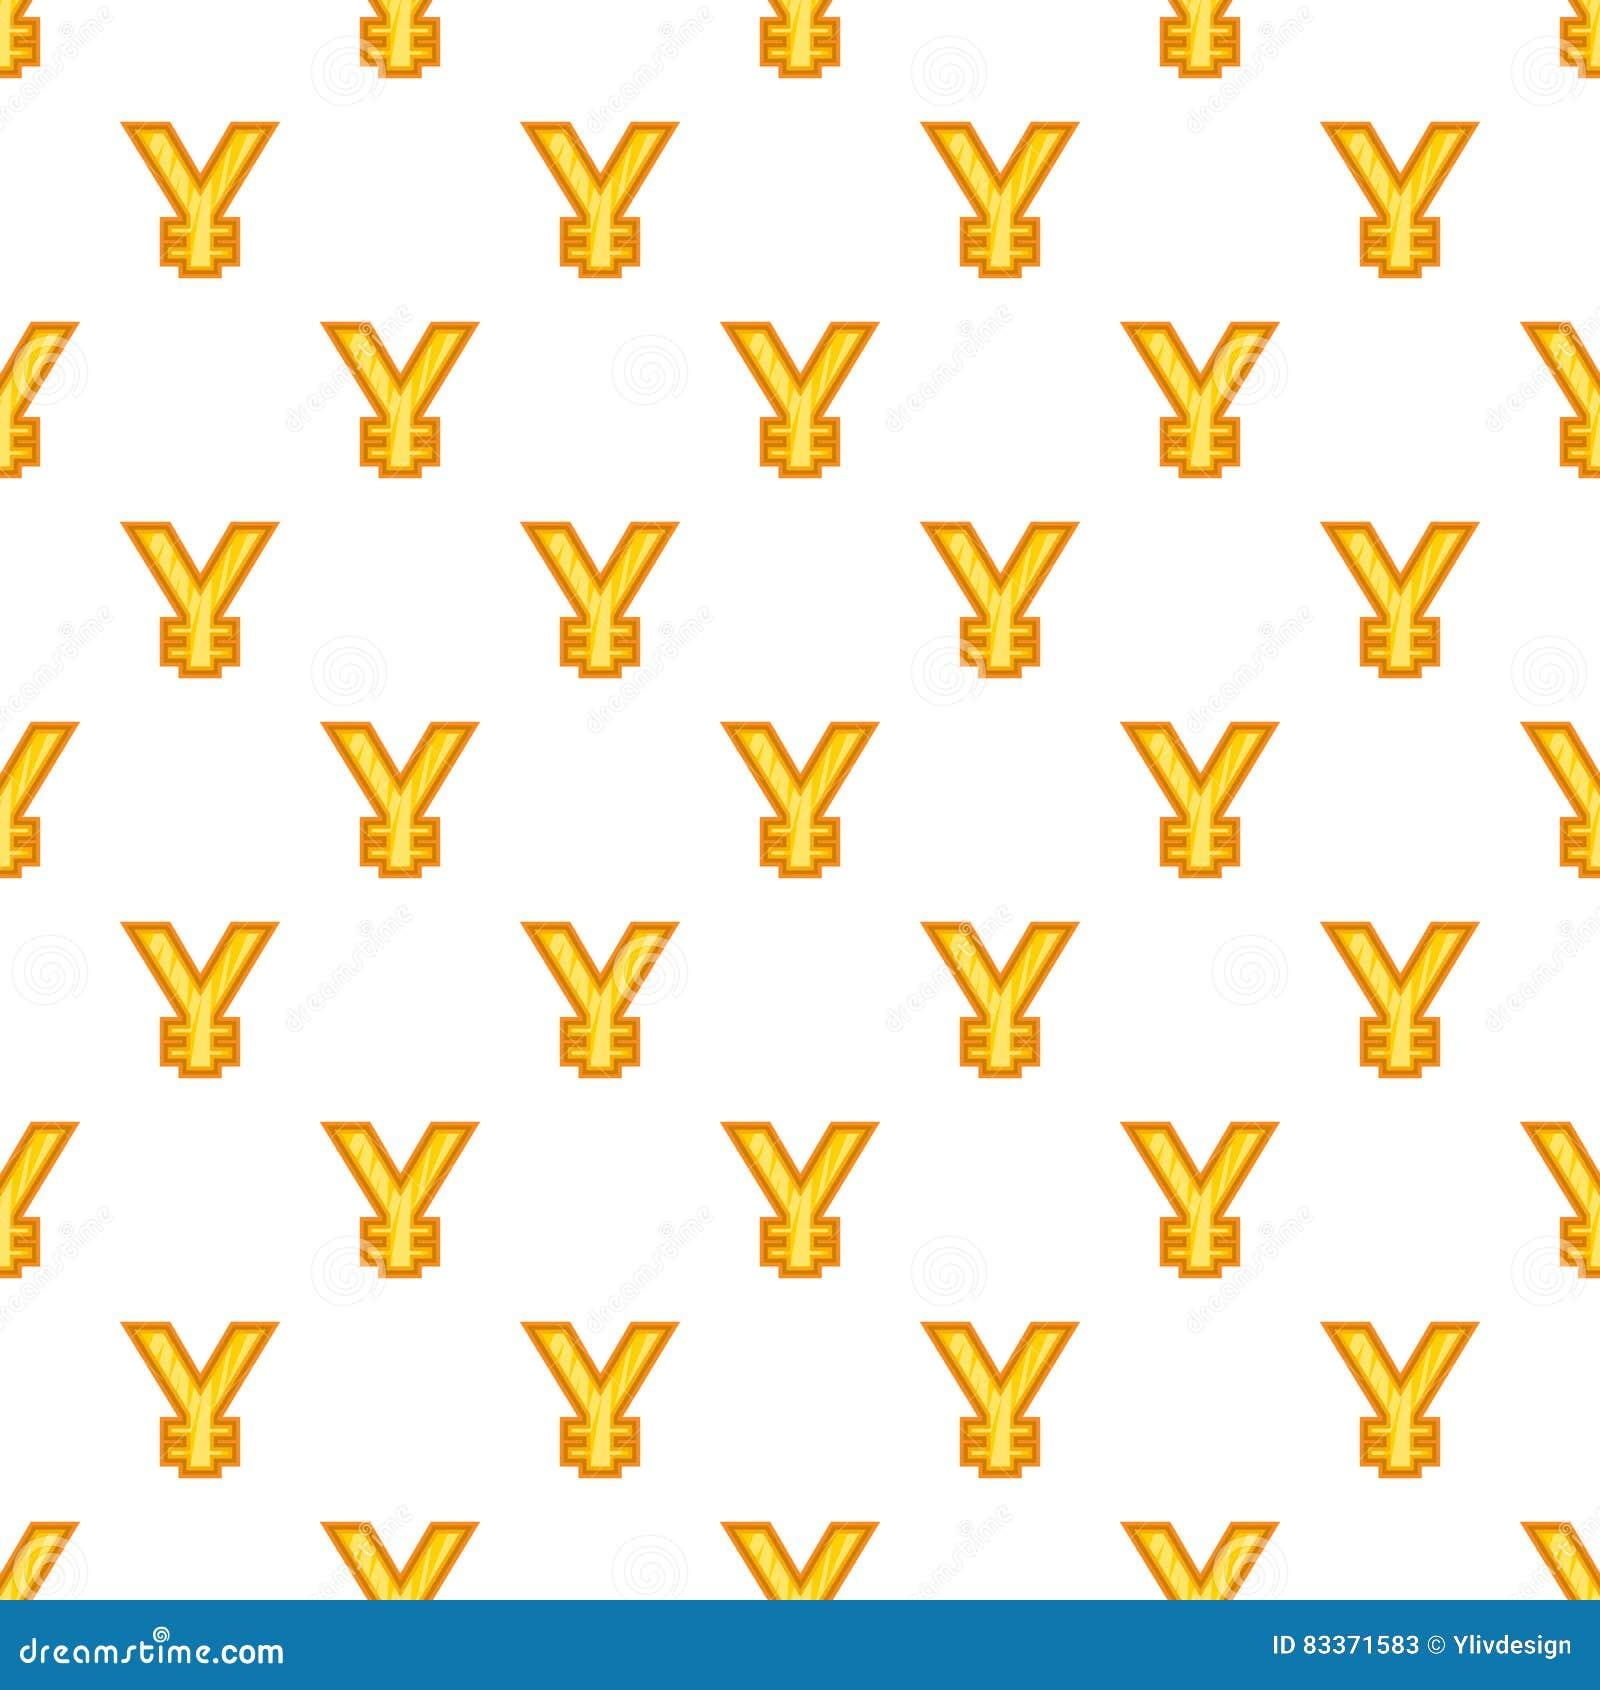 Japan Yen Currency Symbol Pattern Cartoon Style Stock Vector